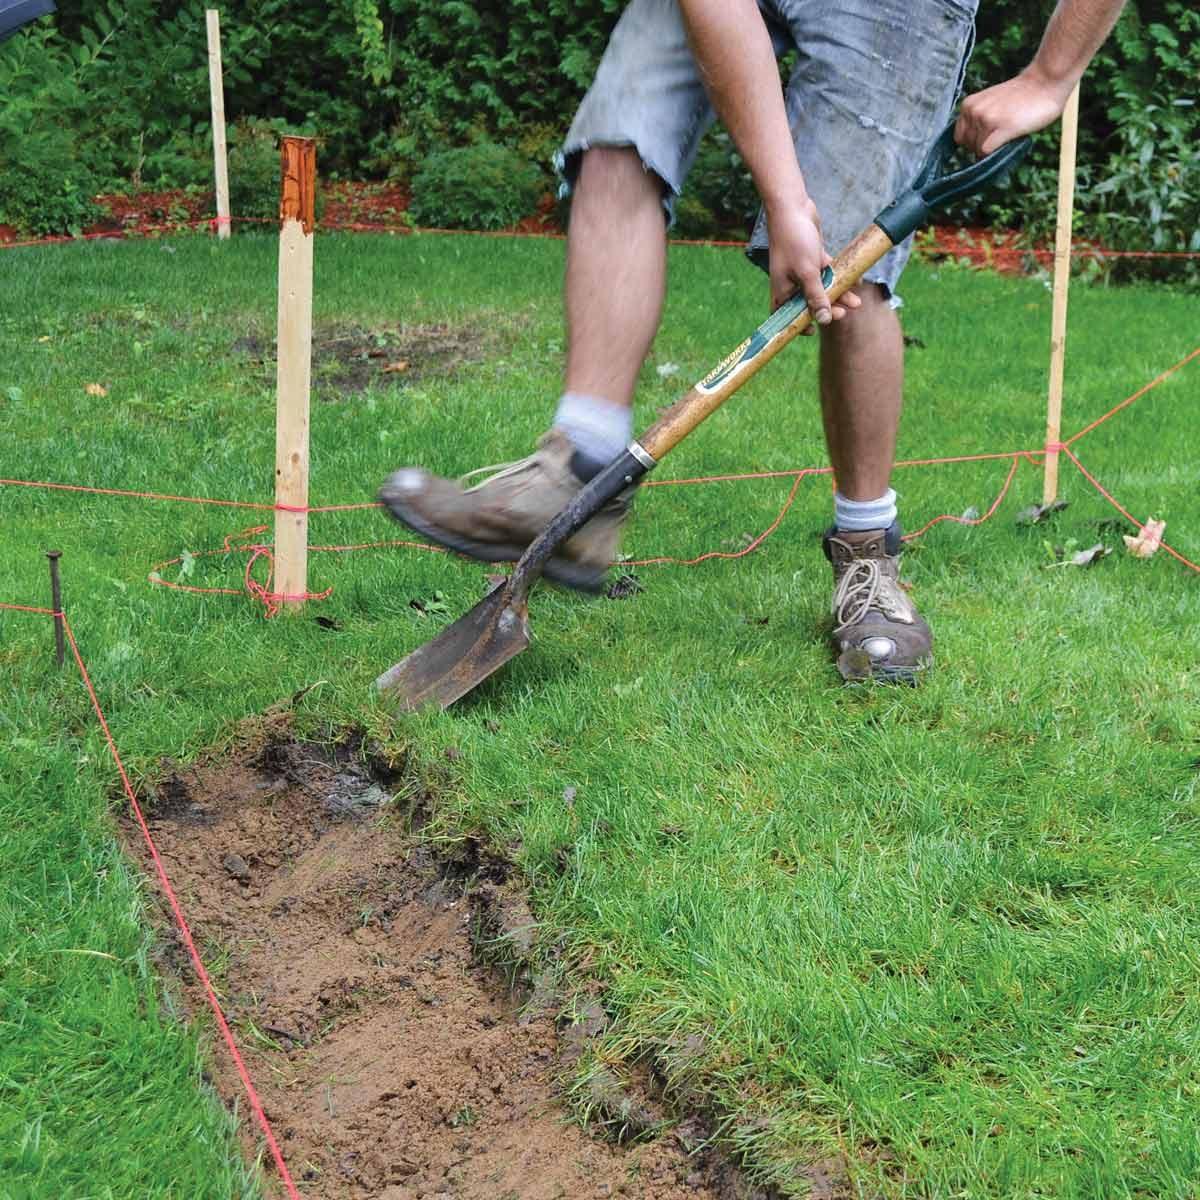 digging equipment